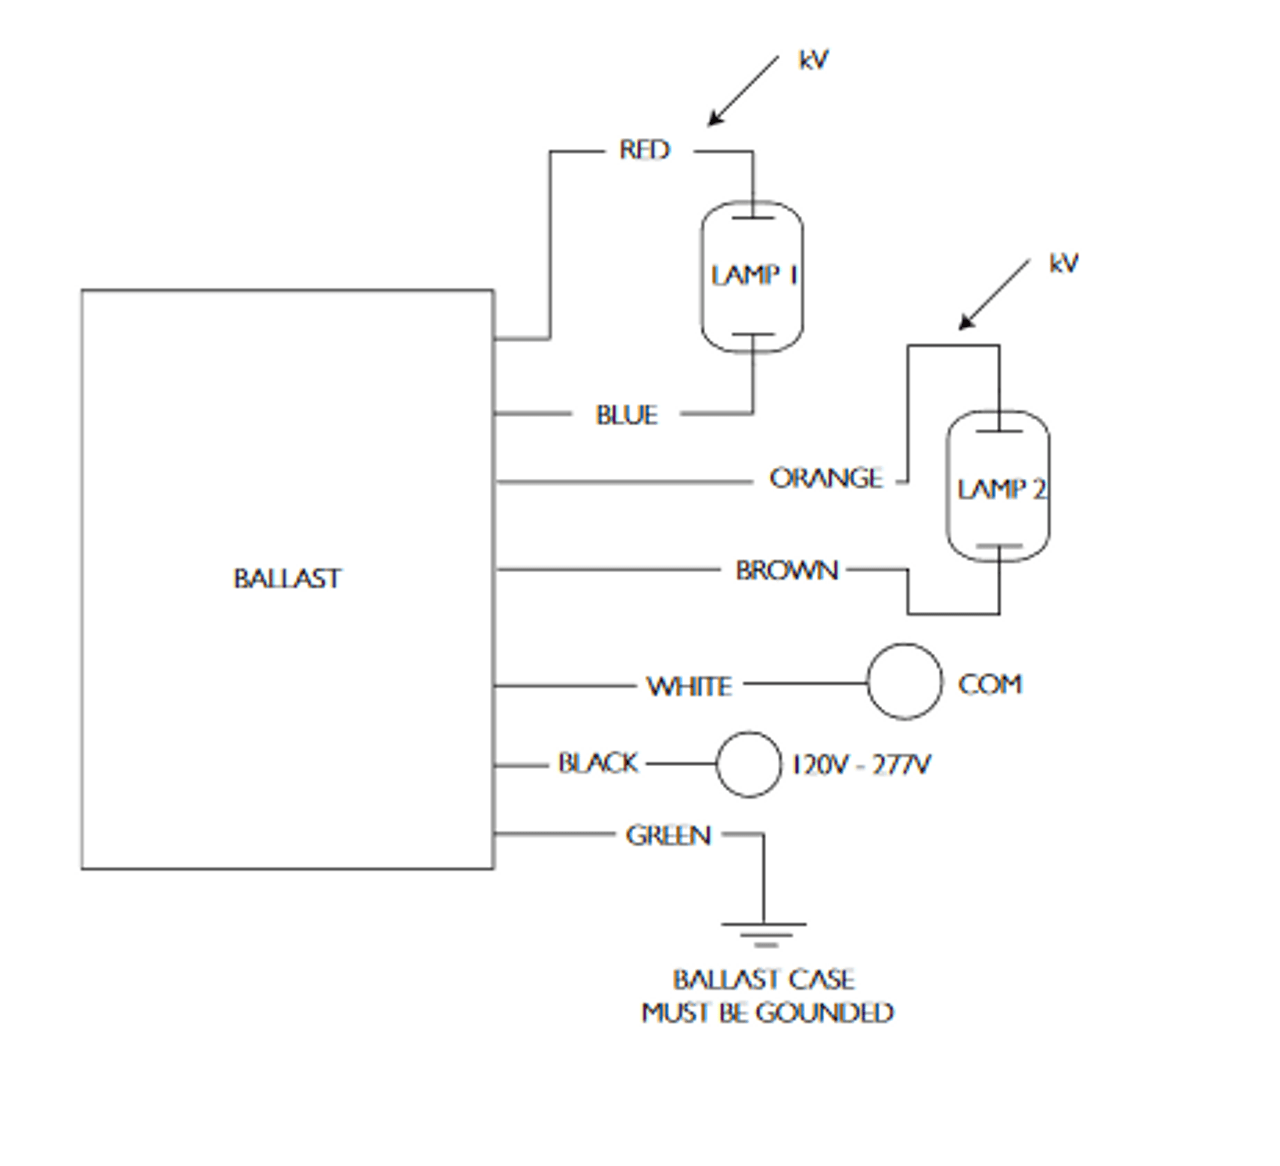 philips advance ballast wiring diagram v on 1963 mopar ignition switch diagram ballast metal halide  [ 1280 x 1166 Pixel ]